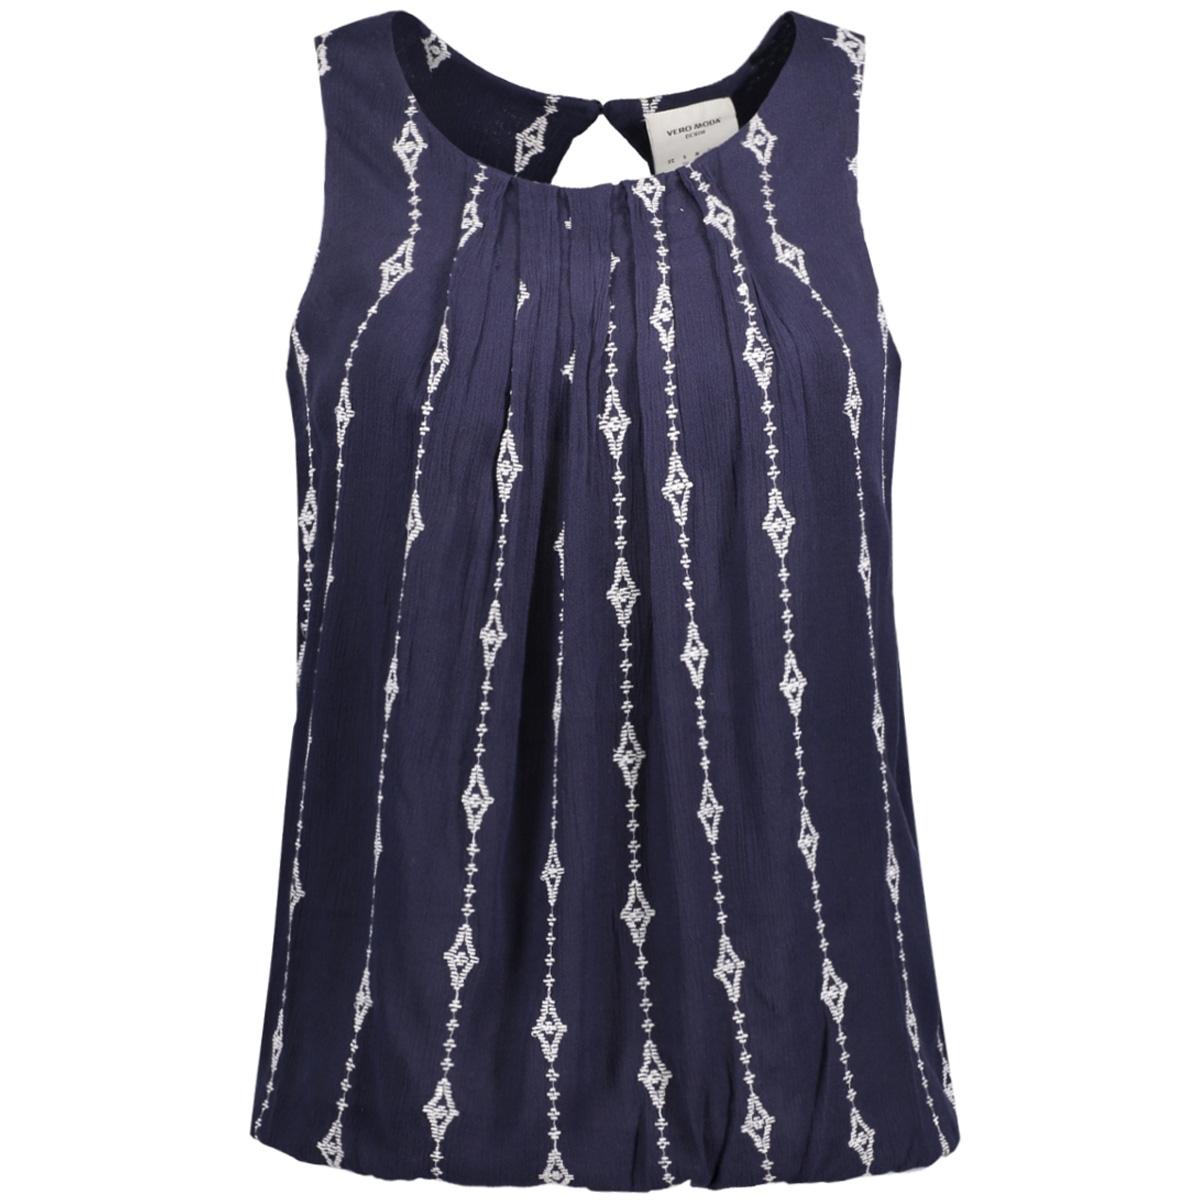 vmjuliana s/l top dnm lcs 10184867 vero moda top navy blazer/embroidery